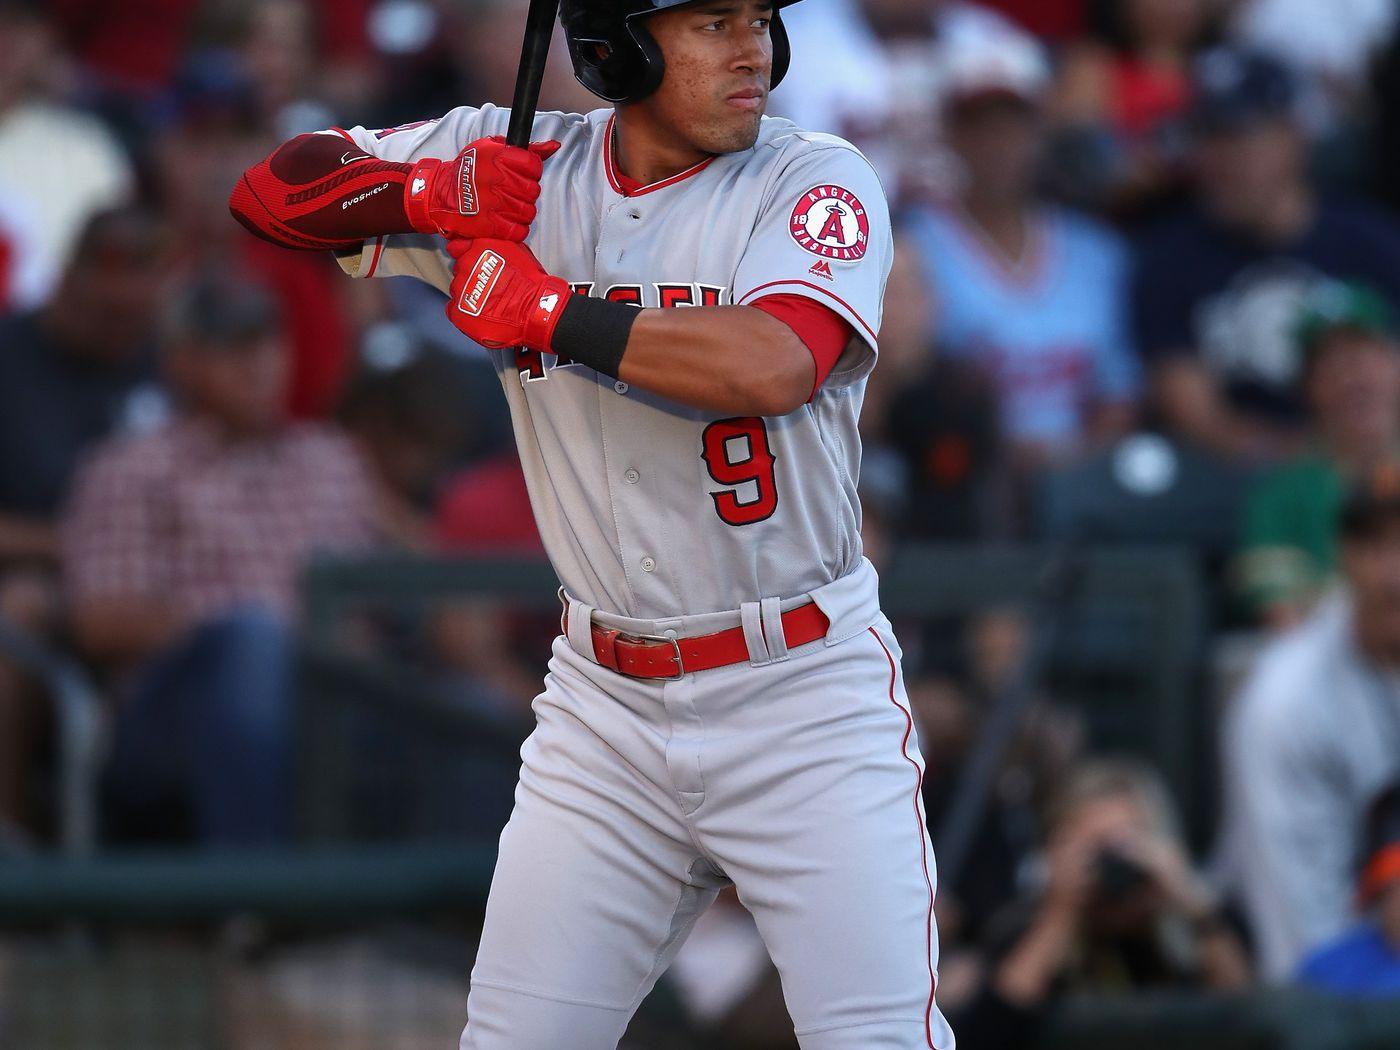 a1277a1e3 Taylor Blake Ward talks Halos prospects and minor league ball - Halos Heaven